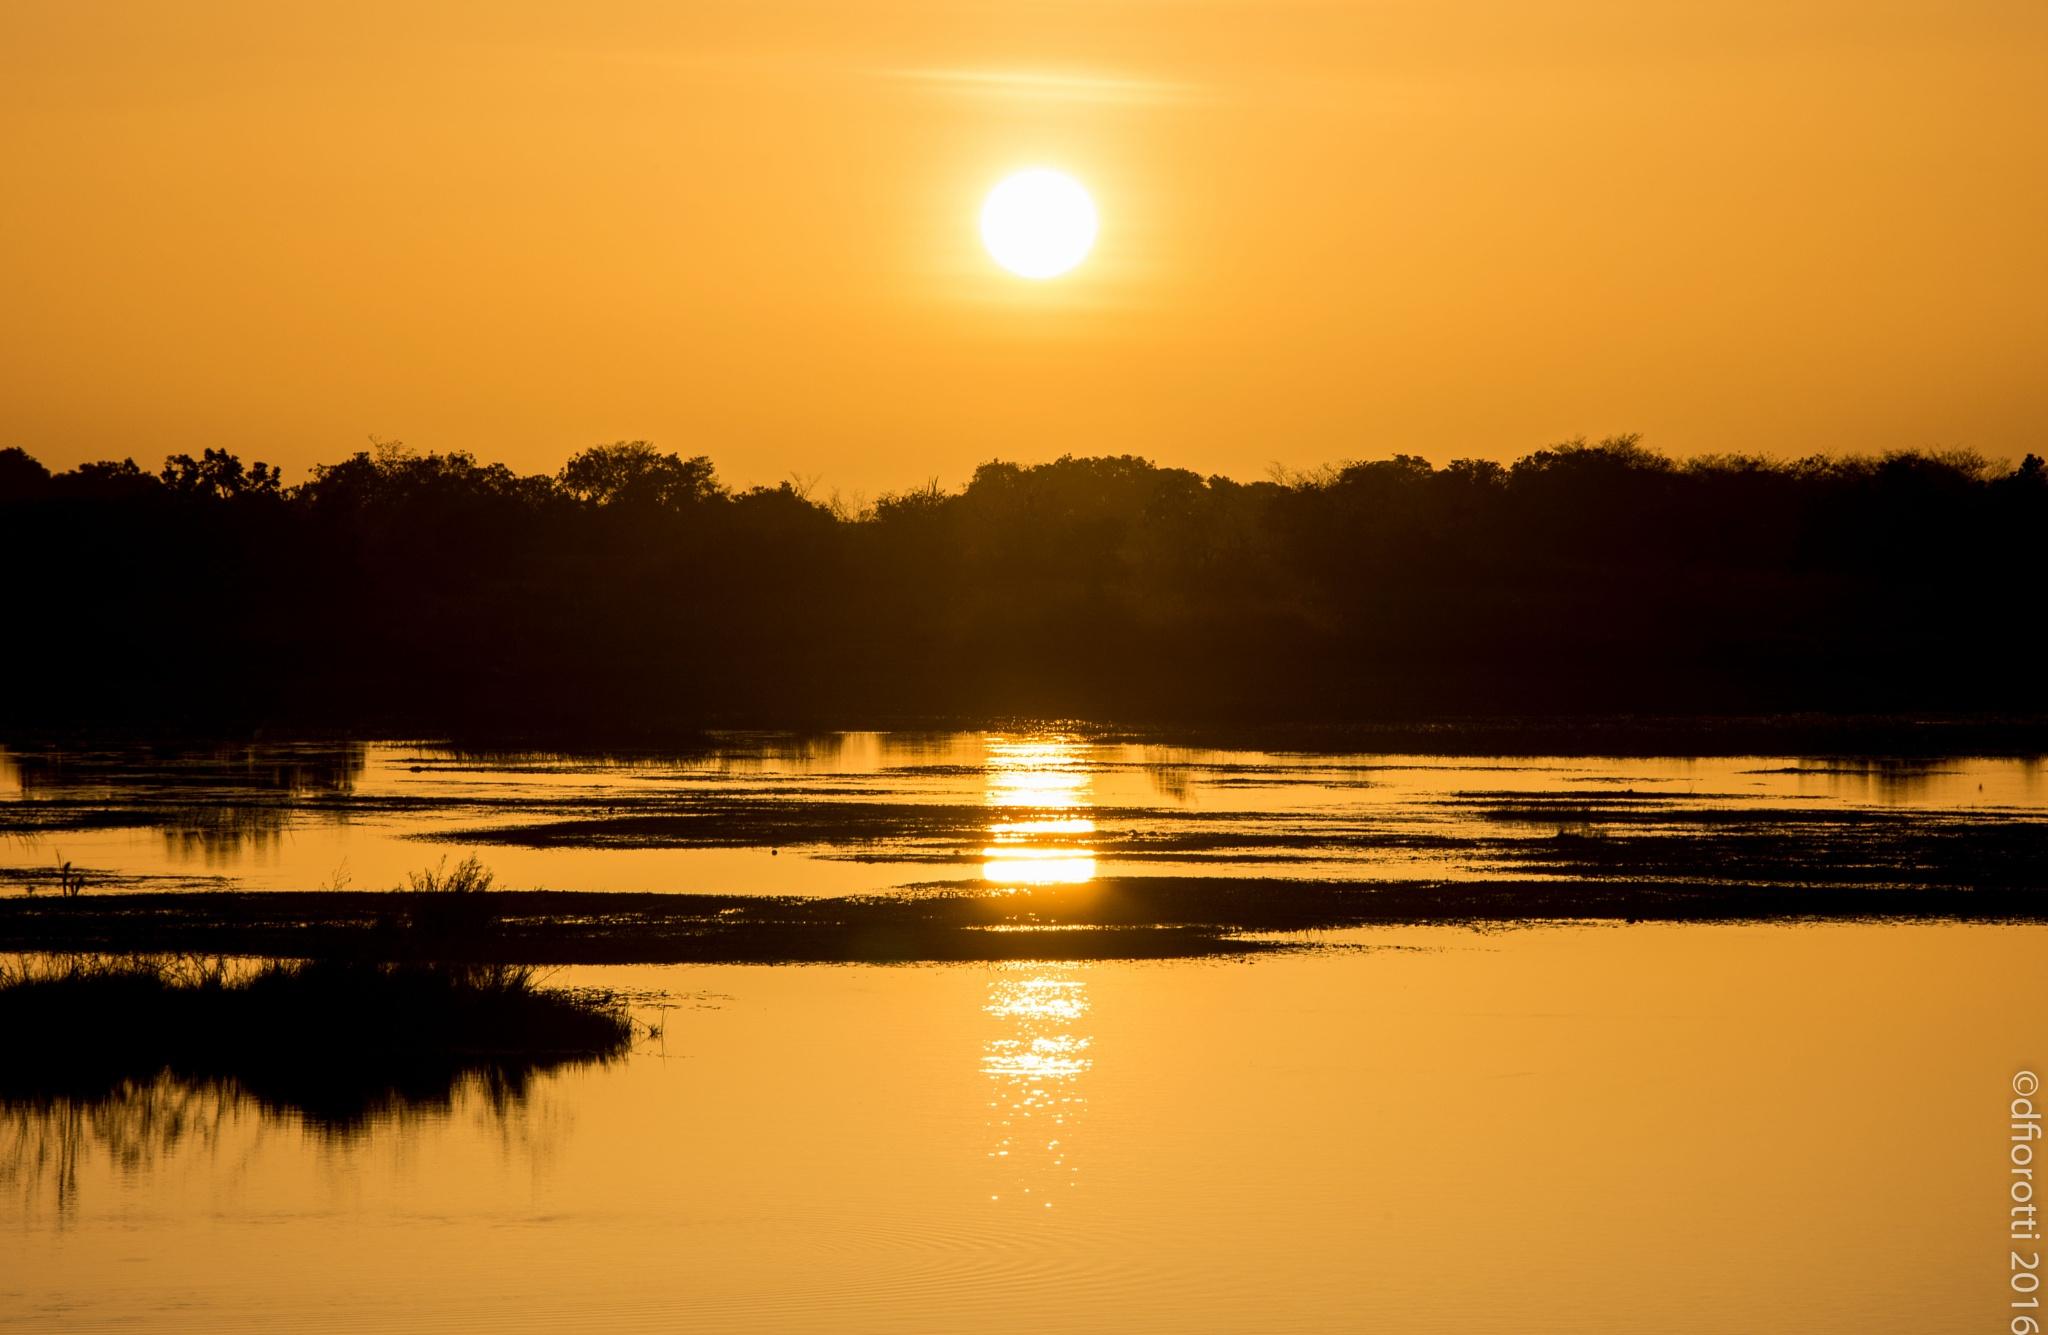 Amazon sunrise by Devair Fiorotti